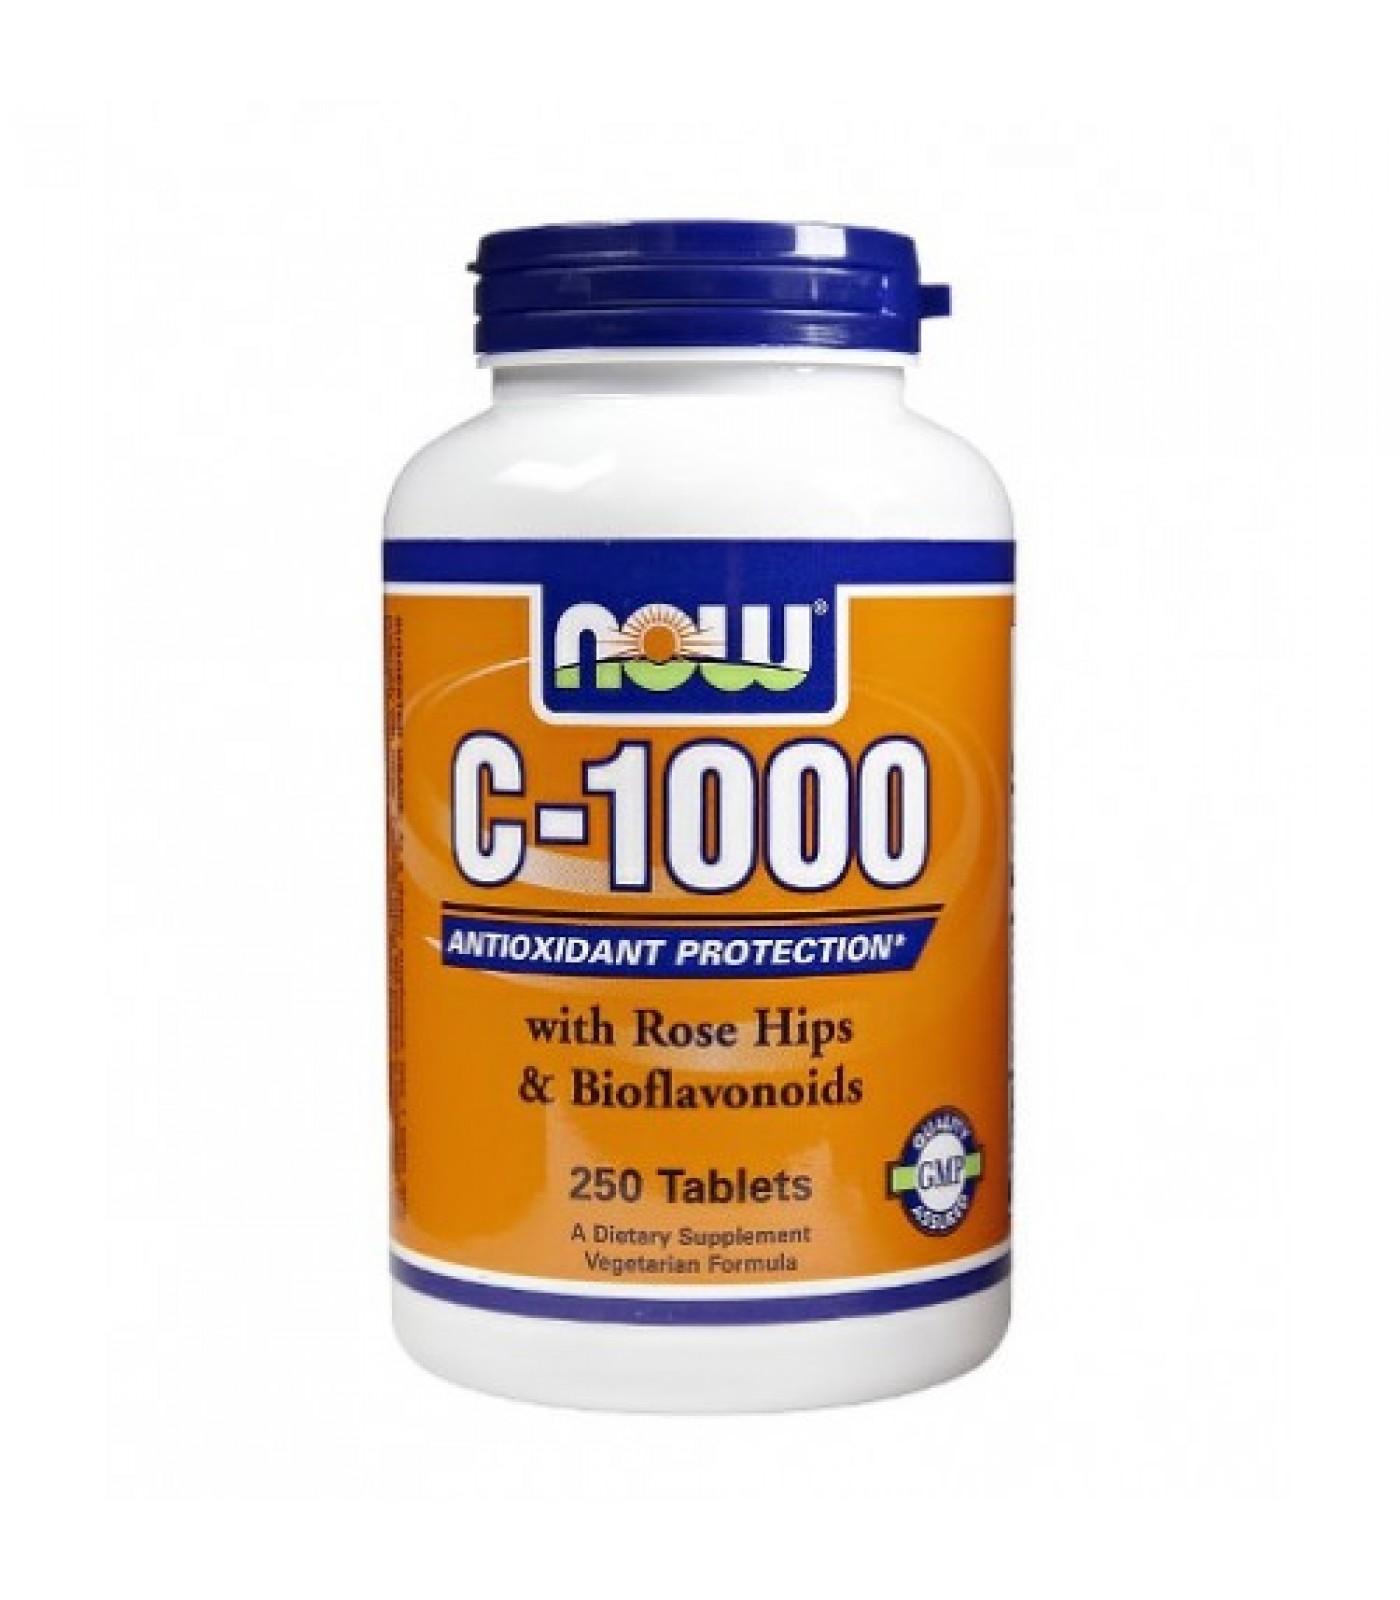 NOW - Vitamin C-1000 / 250 Tabs.